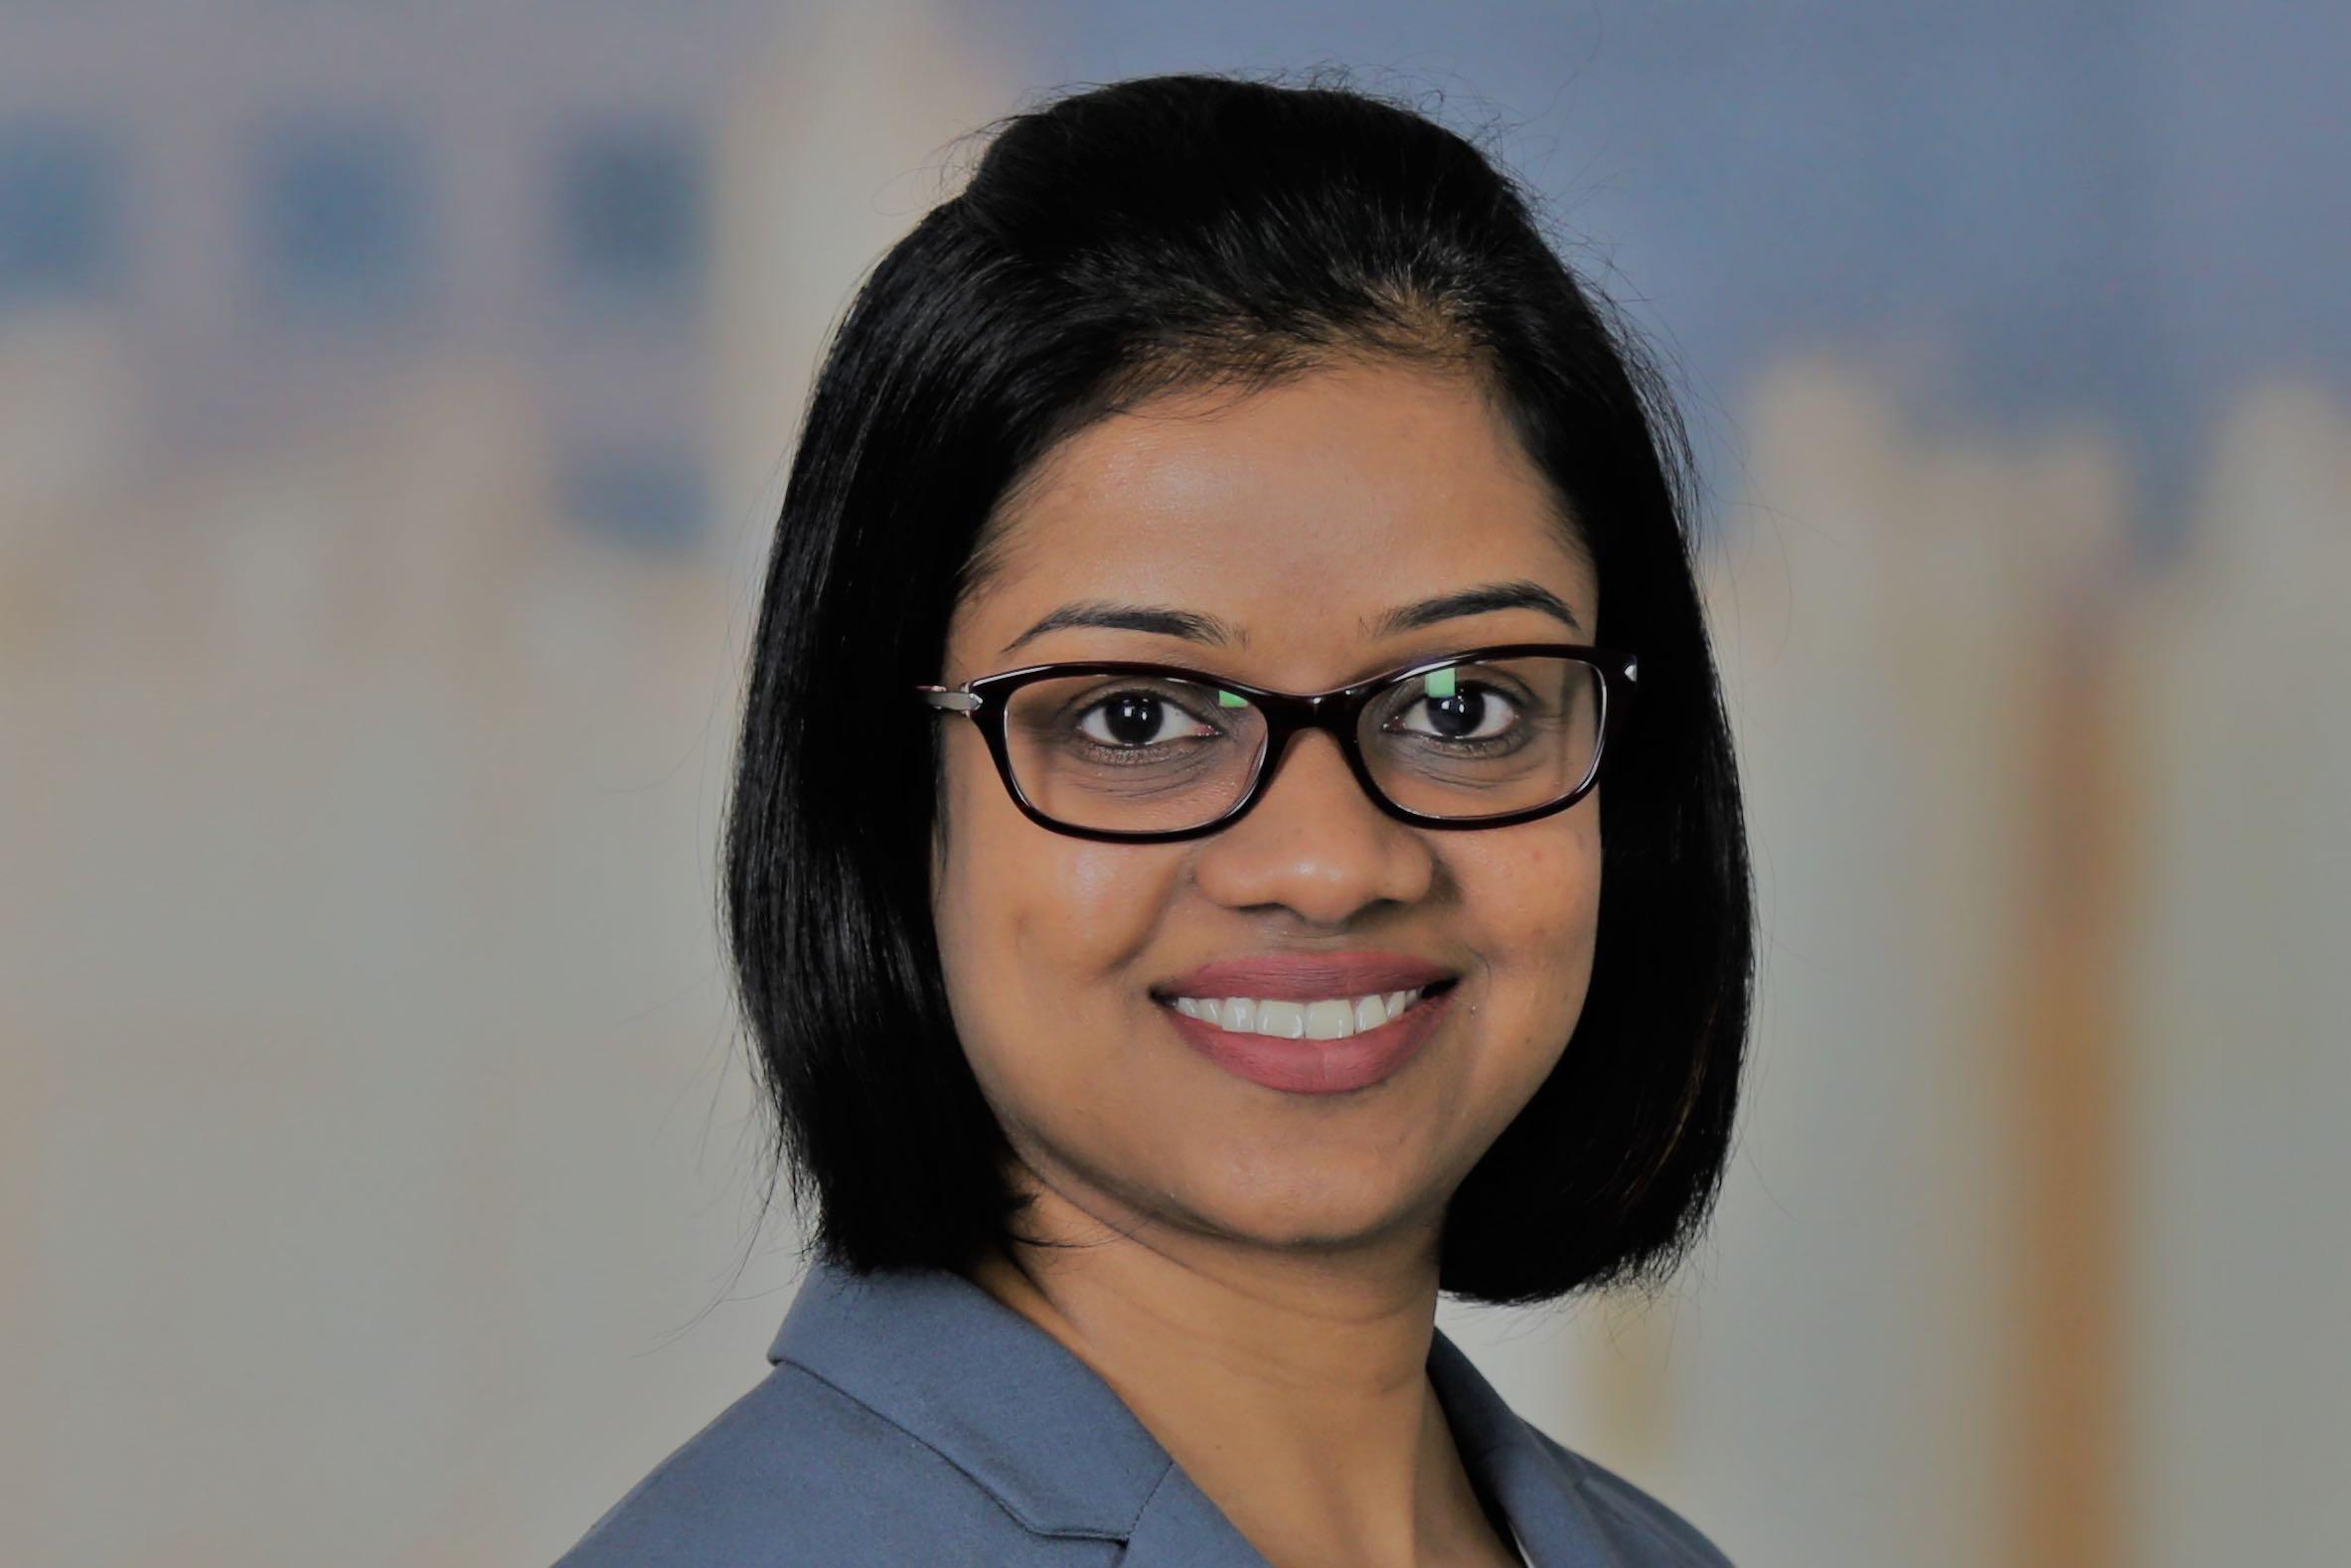 The 2019 Women Leaders in Consulting: Vidisha Suman